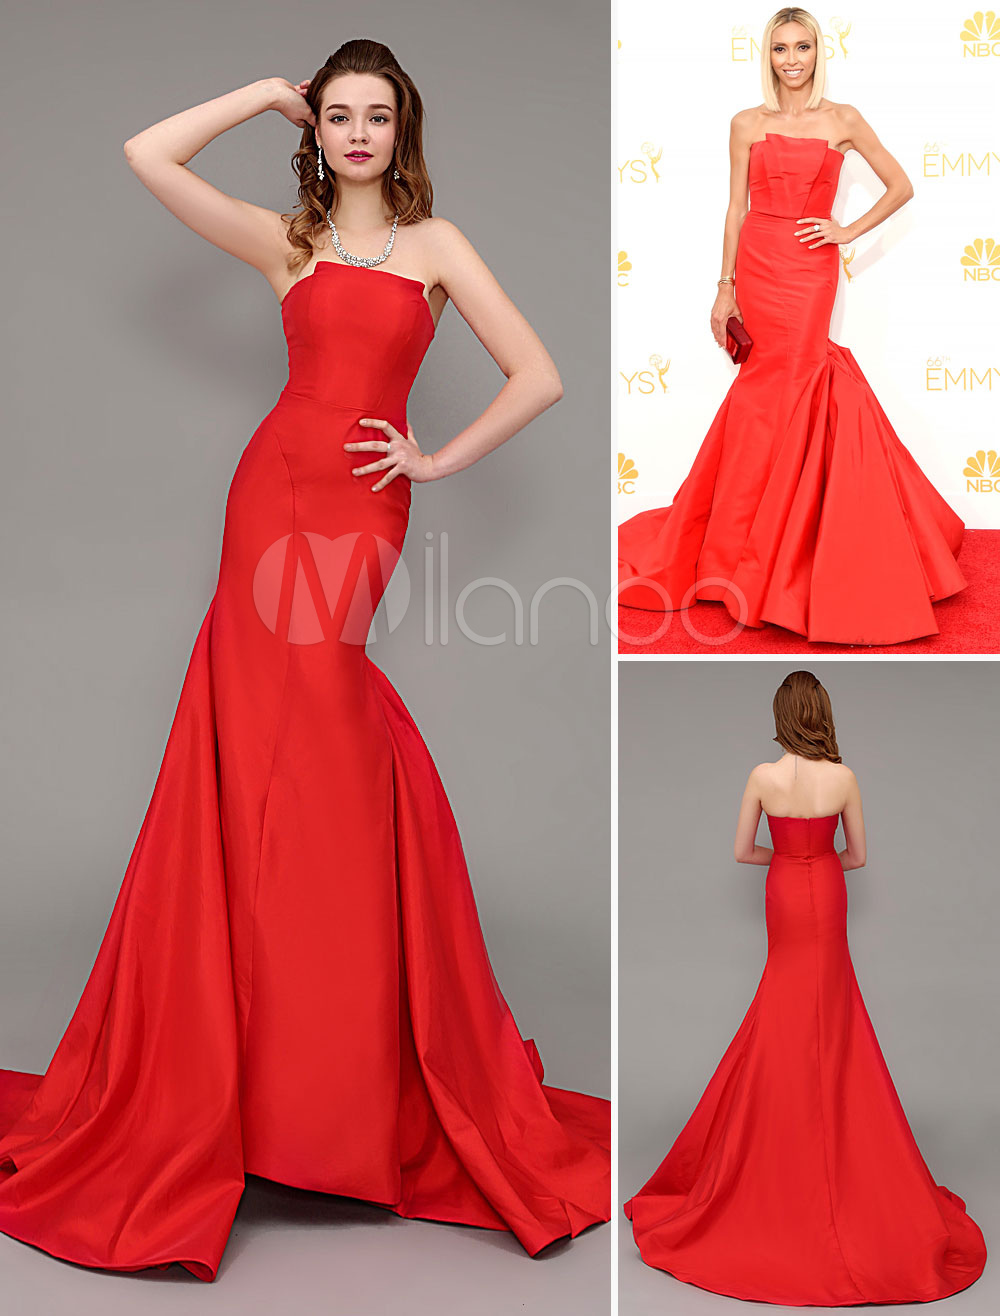 Red Strapless Sweep Celebrity Dress with Elastic Silk Like Satin (Wedding Emmy Awards Dresses) photo